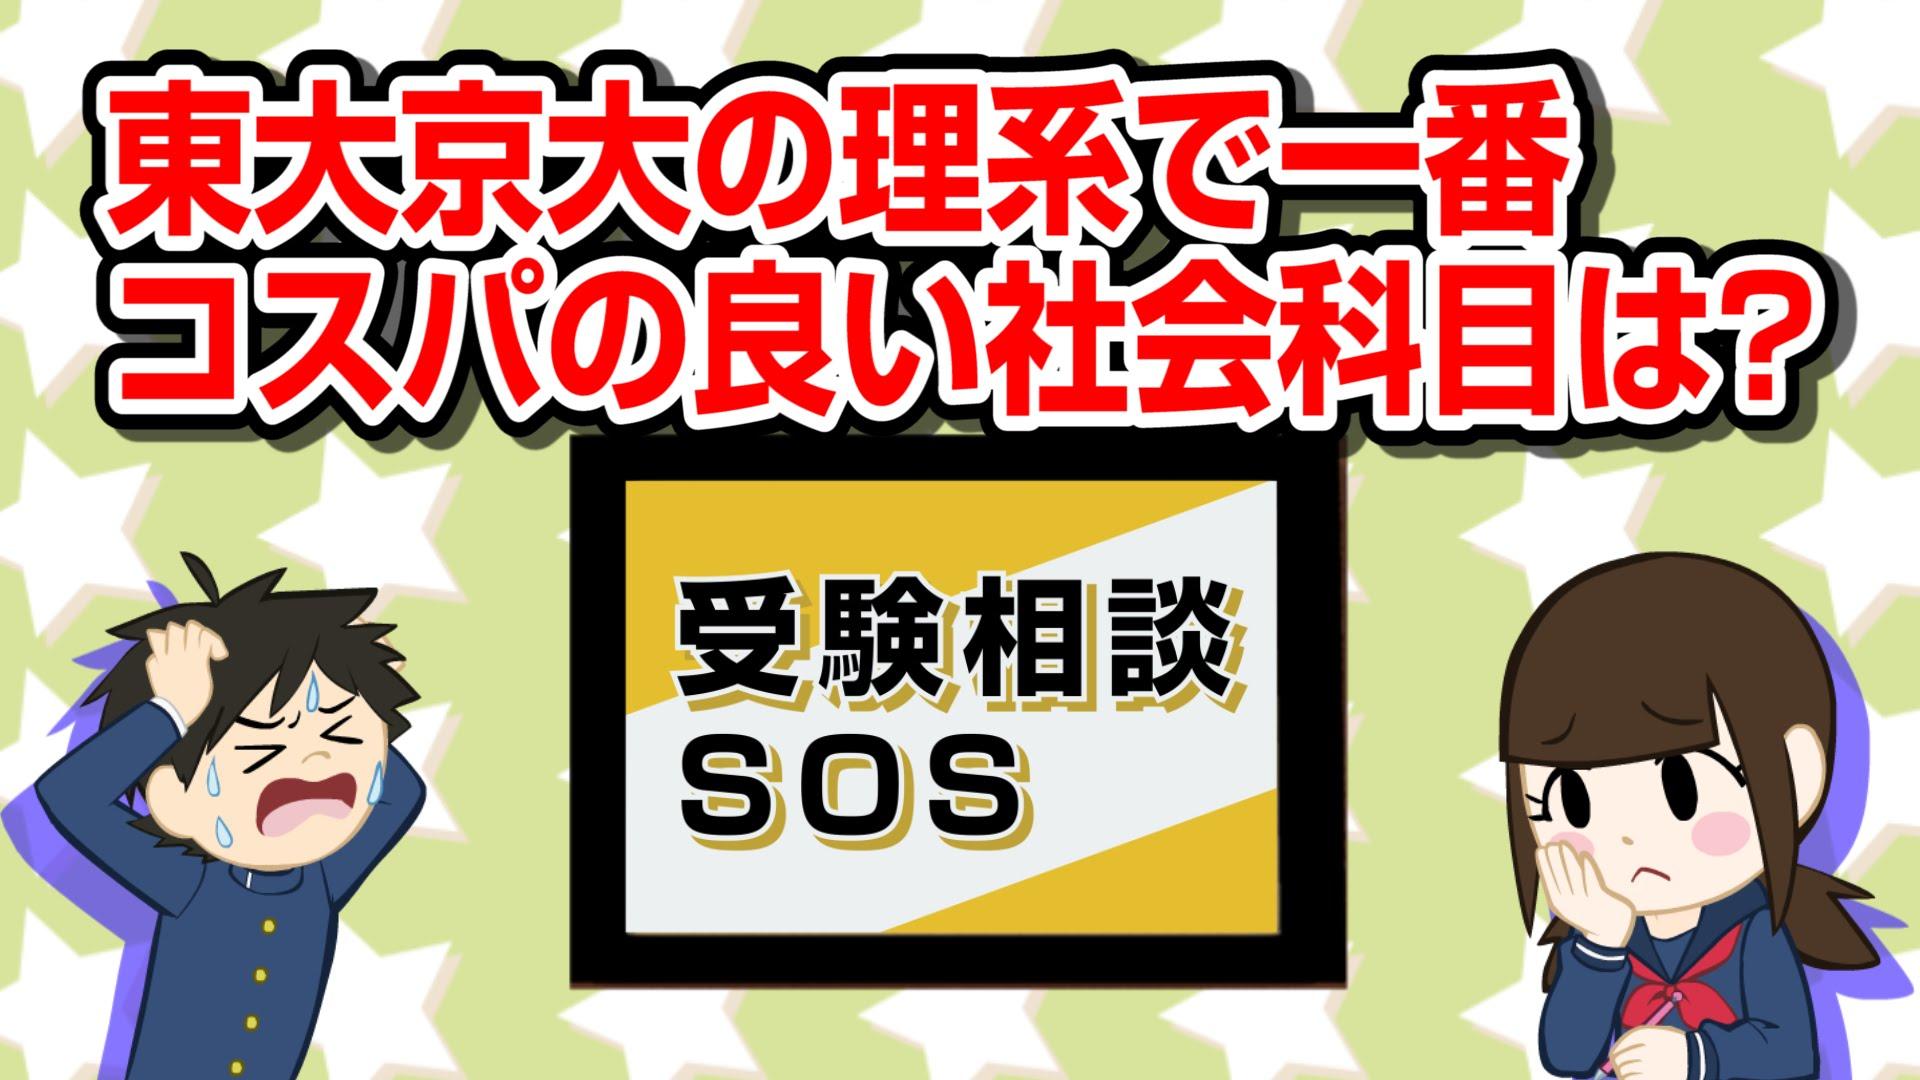 【vol.77】東大京大の理系で一番コスパの良い社会科目は?|受験相談SOS